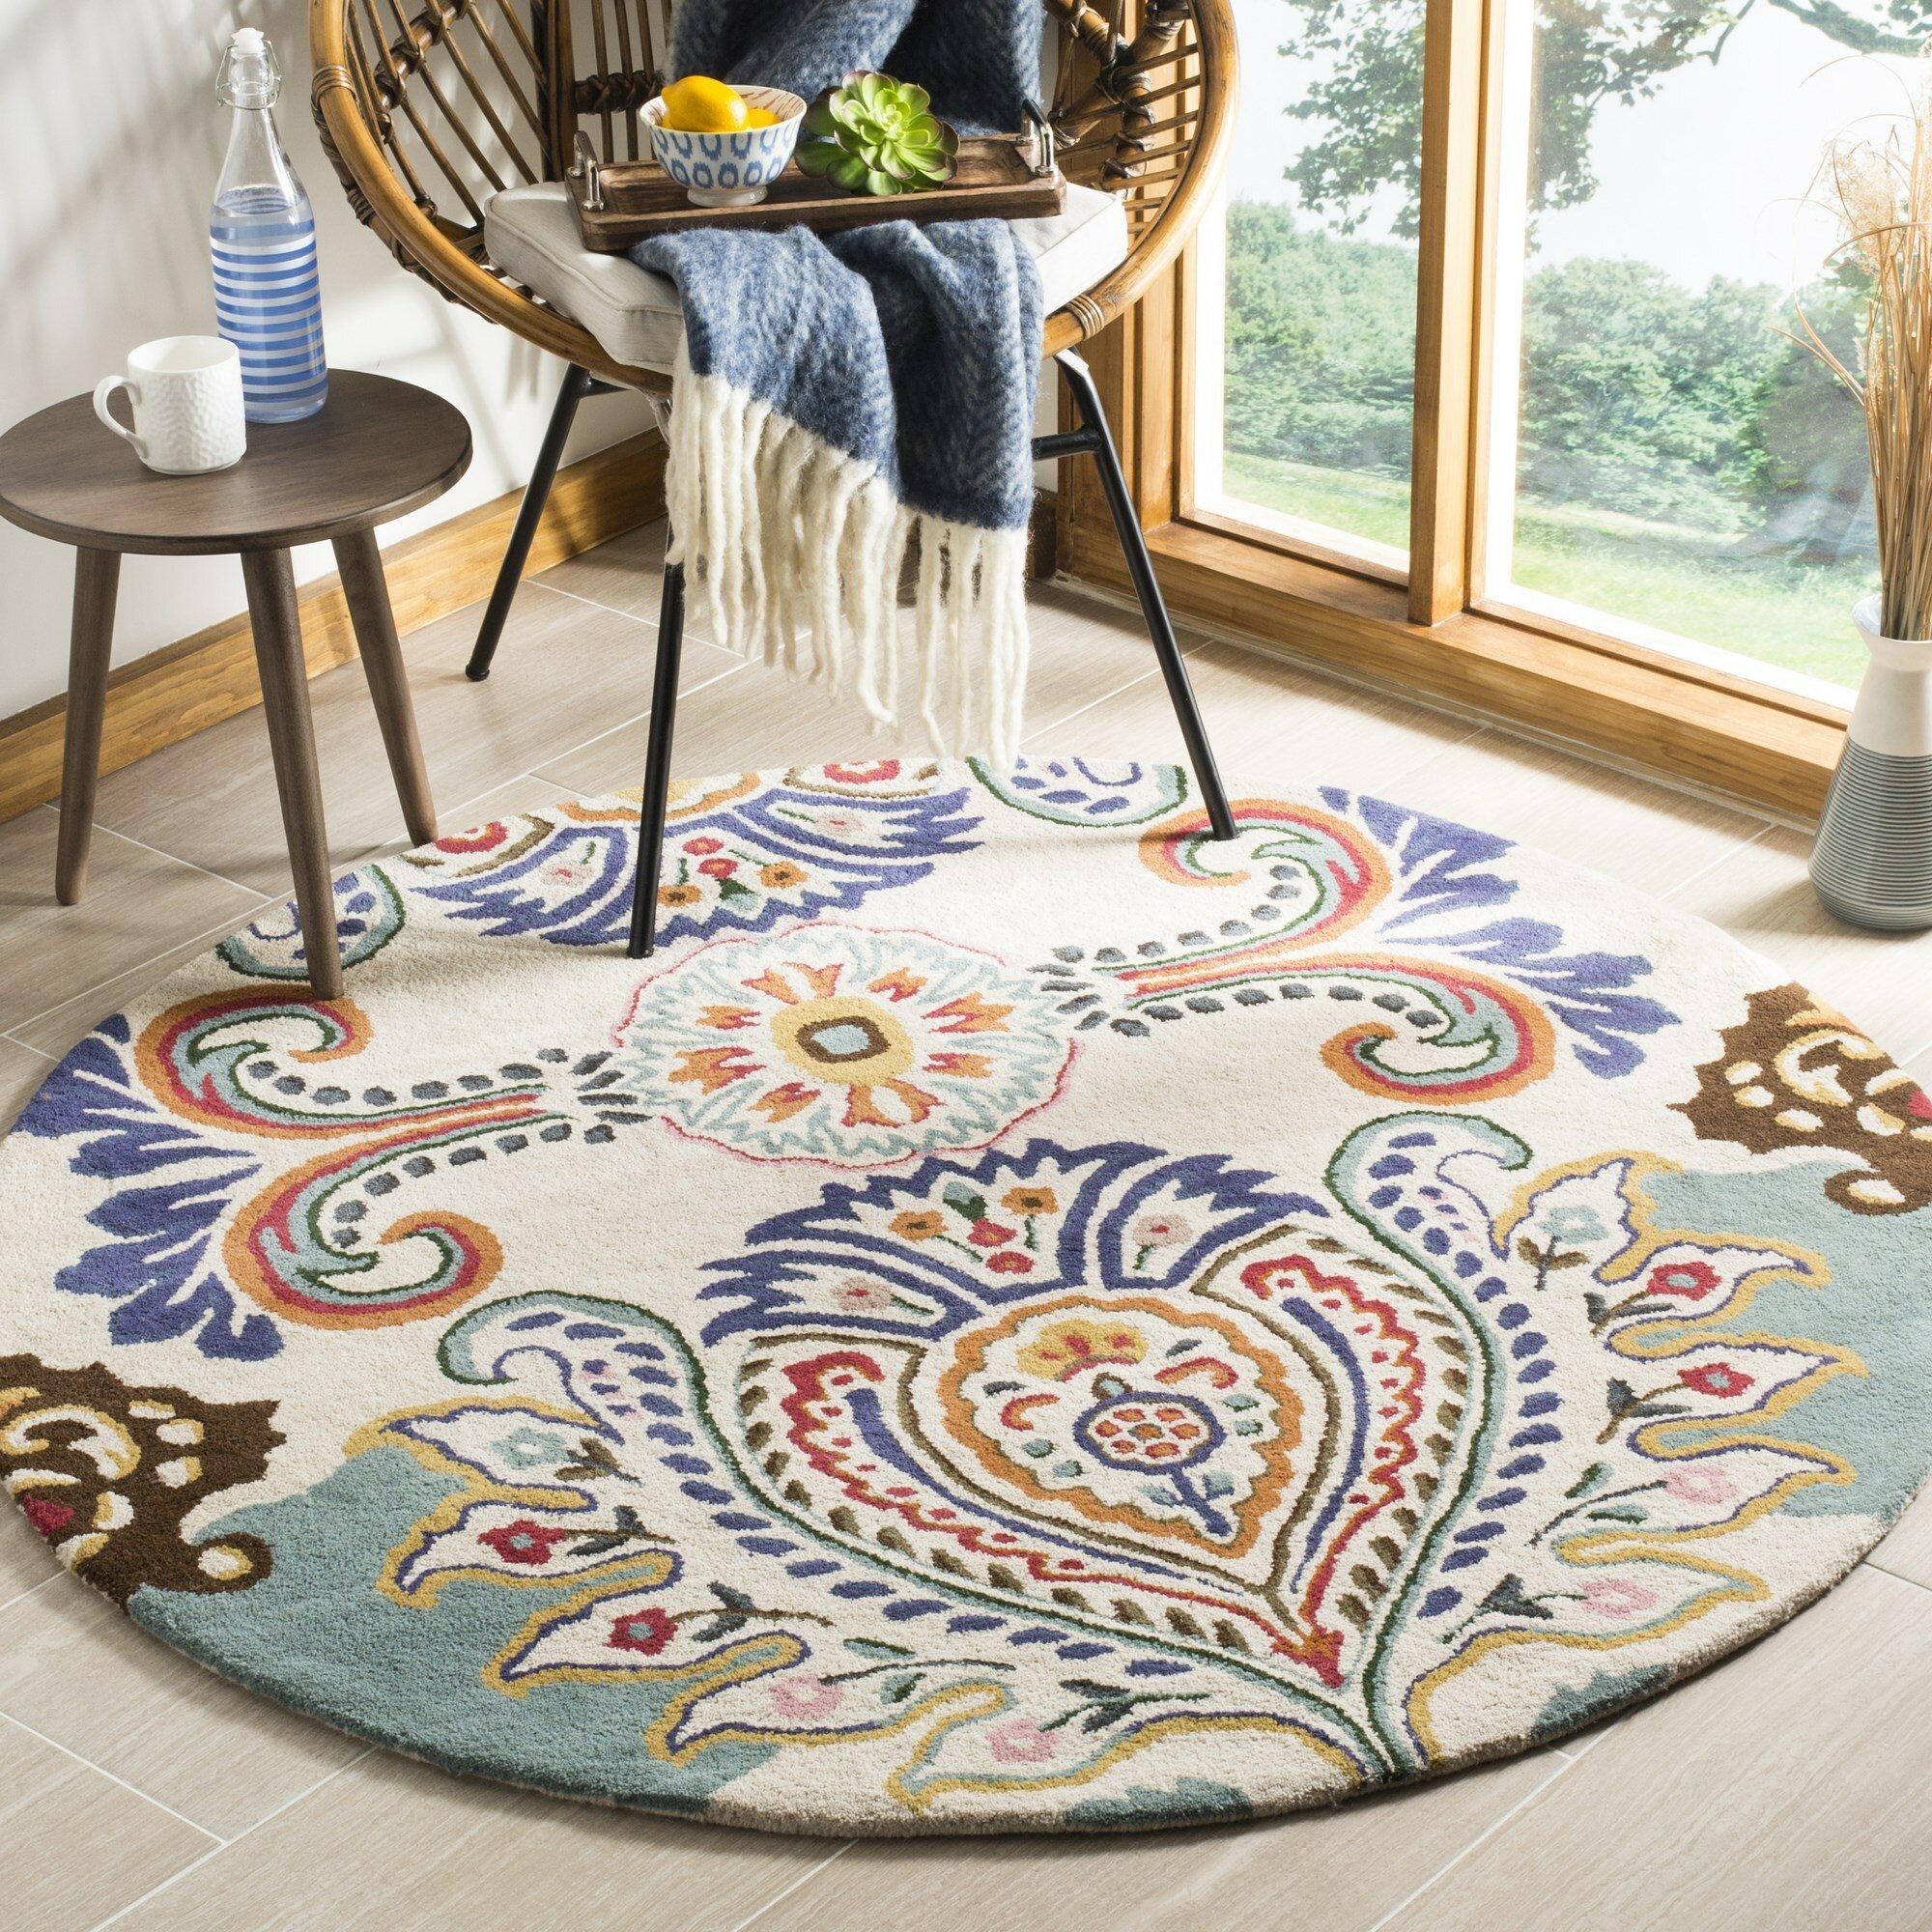 cievi rug rugs bohemian and home joss design smartness area exquisite main